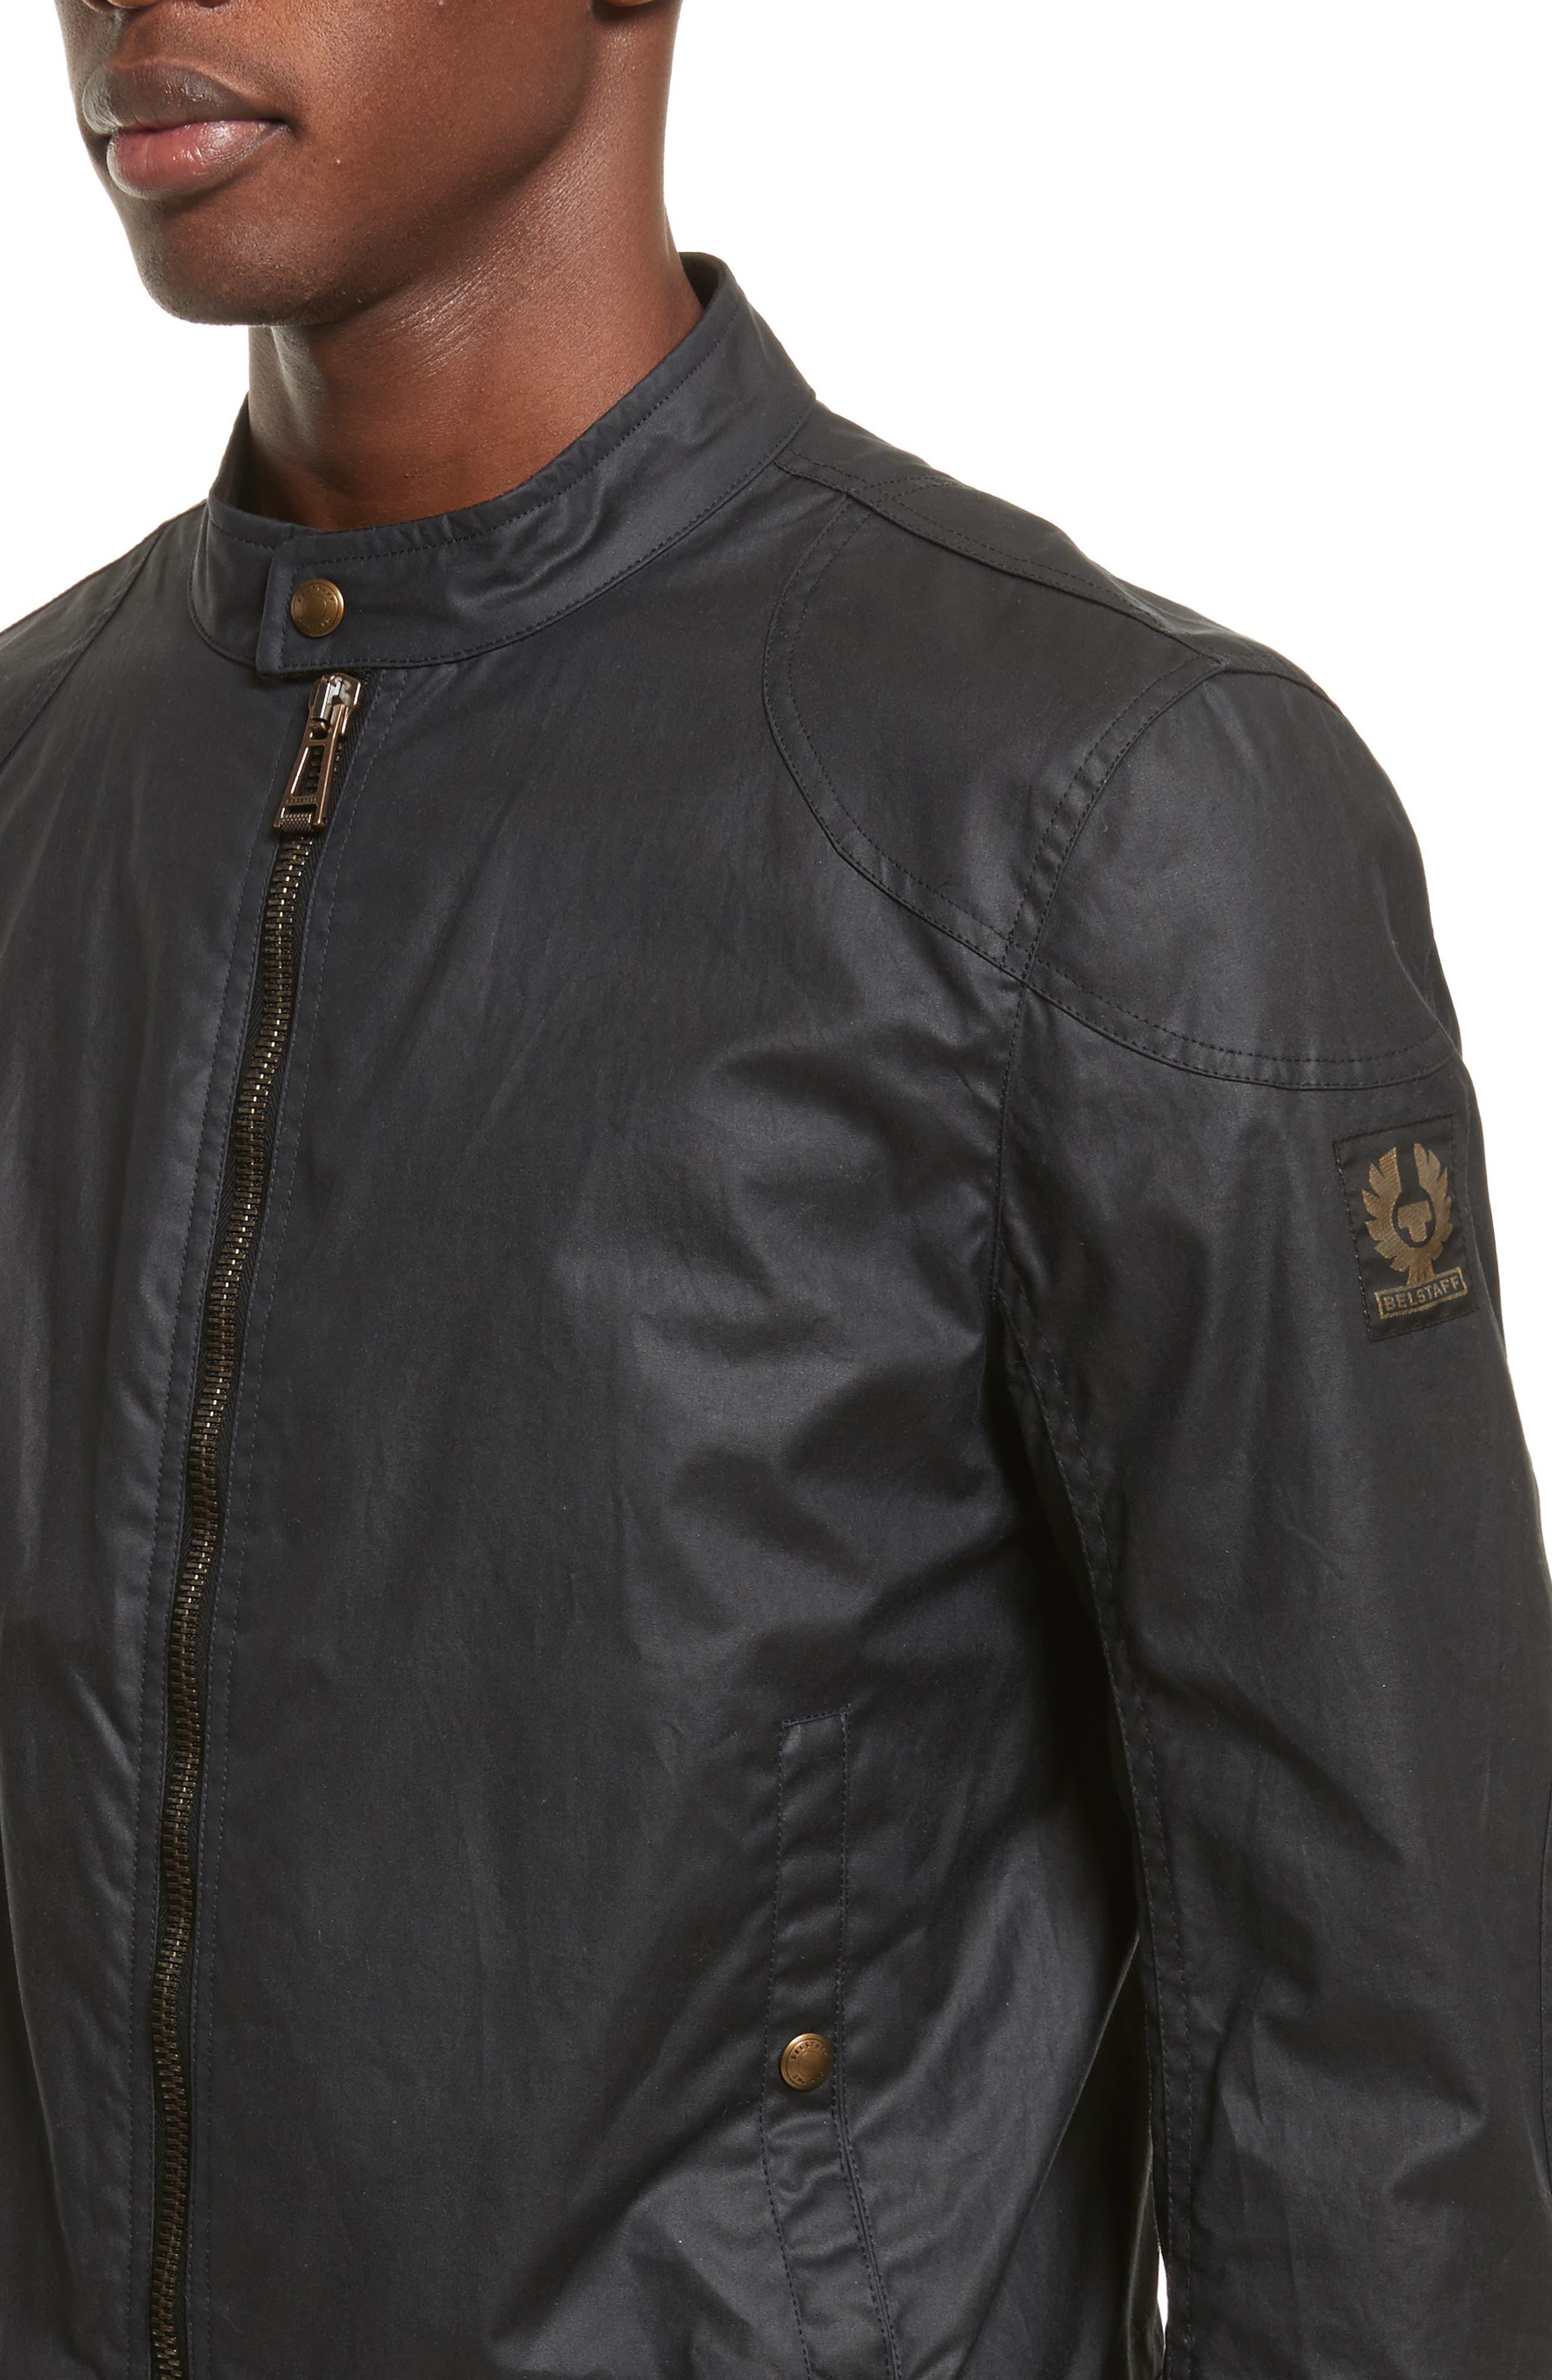 Kelland Coated Cotton Moto Jacket,                             Alternate thumbnail 4, color,                             DARK NAVY